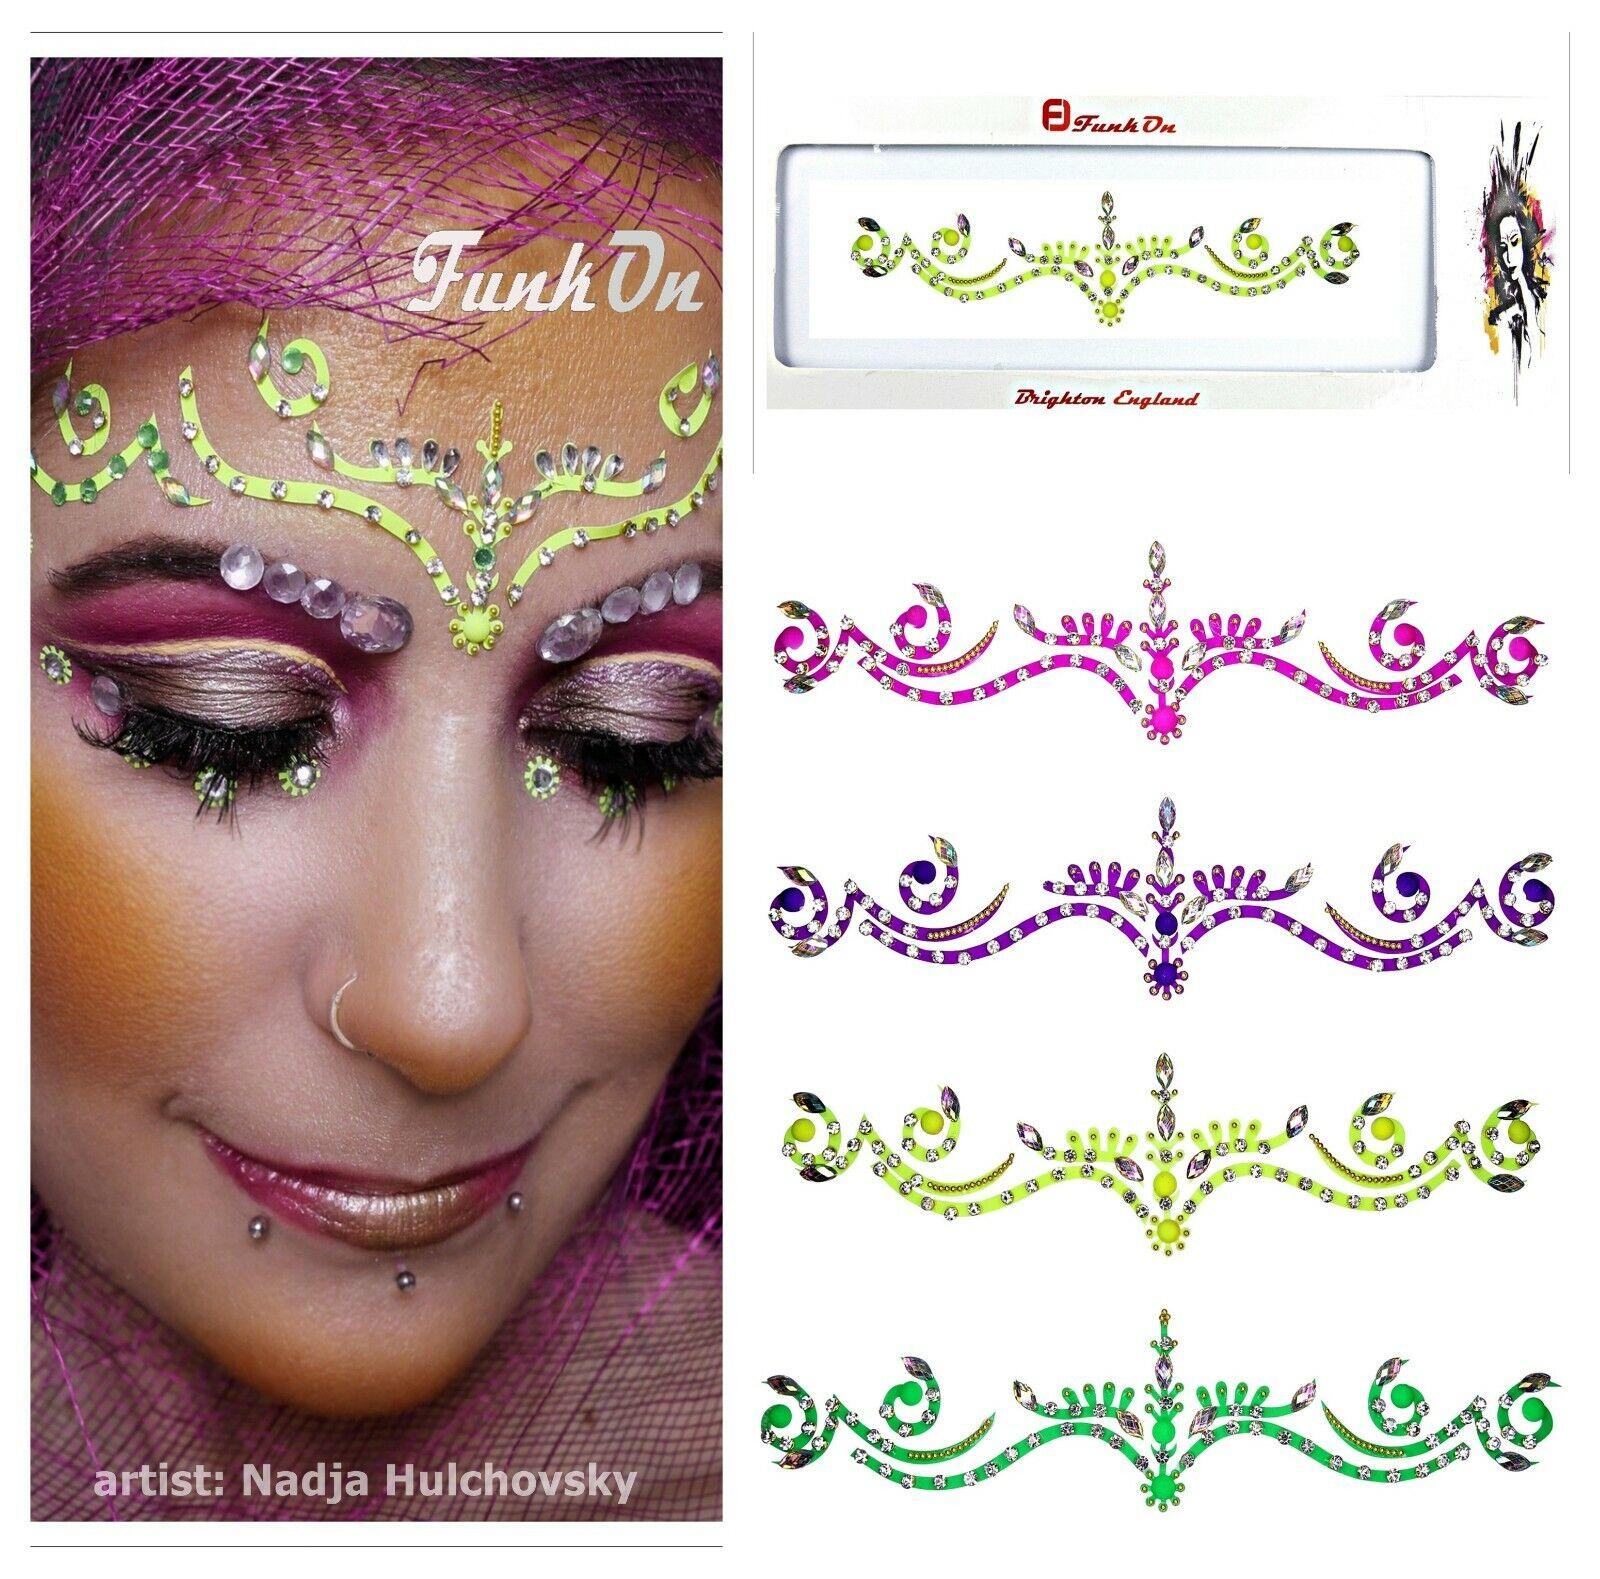 Finden, vergleichen, kaufen - Neon self adhesive BINDI-FACE GEM-FESTIVAL FACE JEWEL Body Tattoo Rave Makeup UK auf eBay.co.uk ab 1.89 GBP